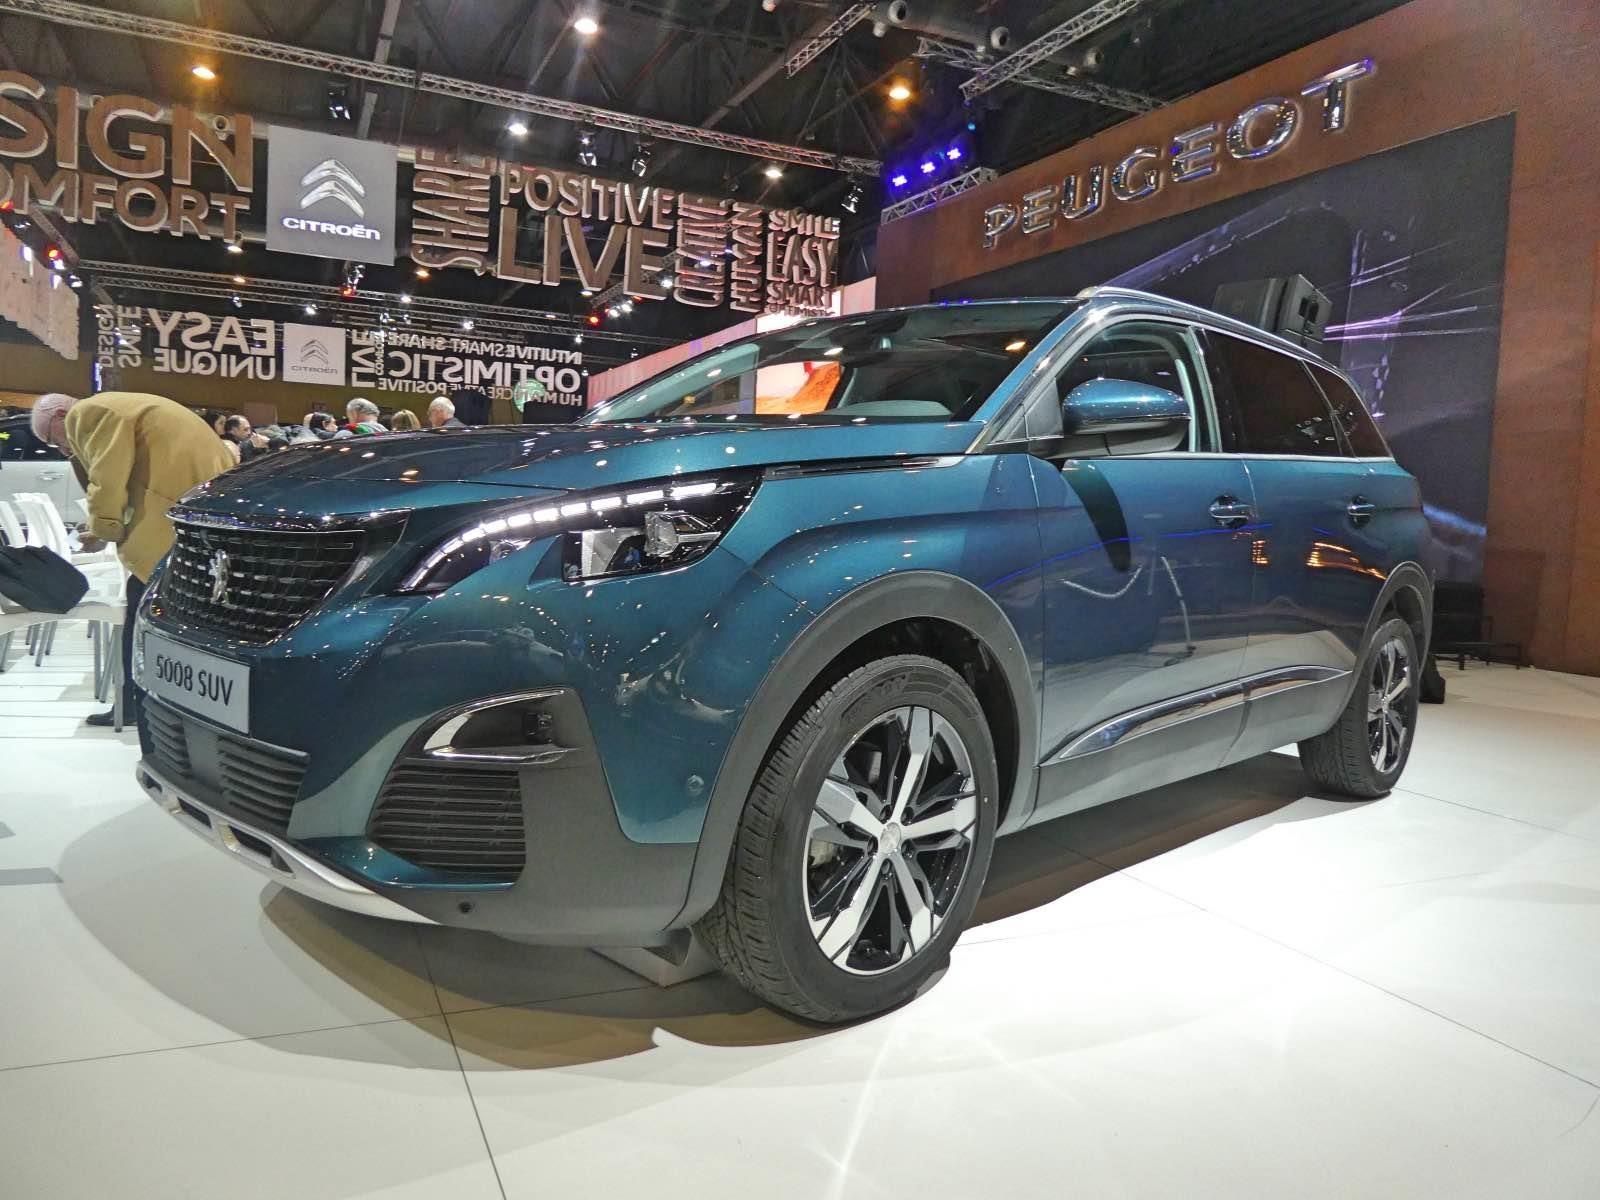 Novedades de Buenos Aires: Peugeot 5008